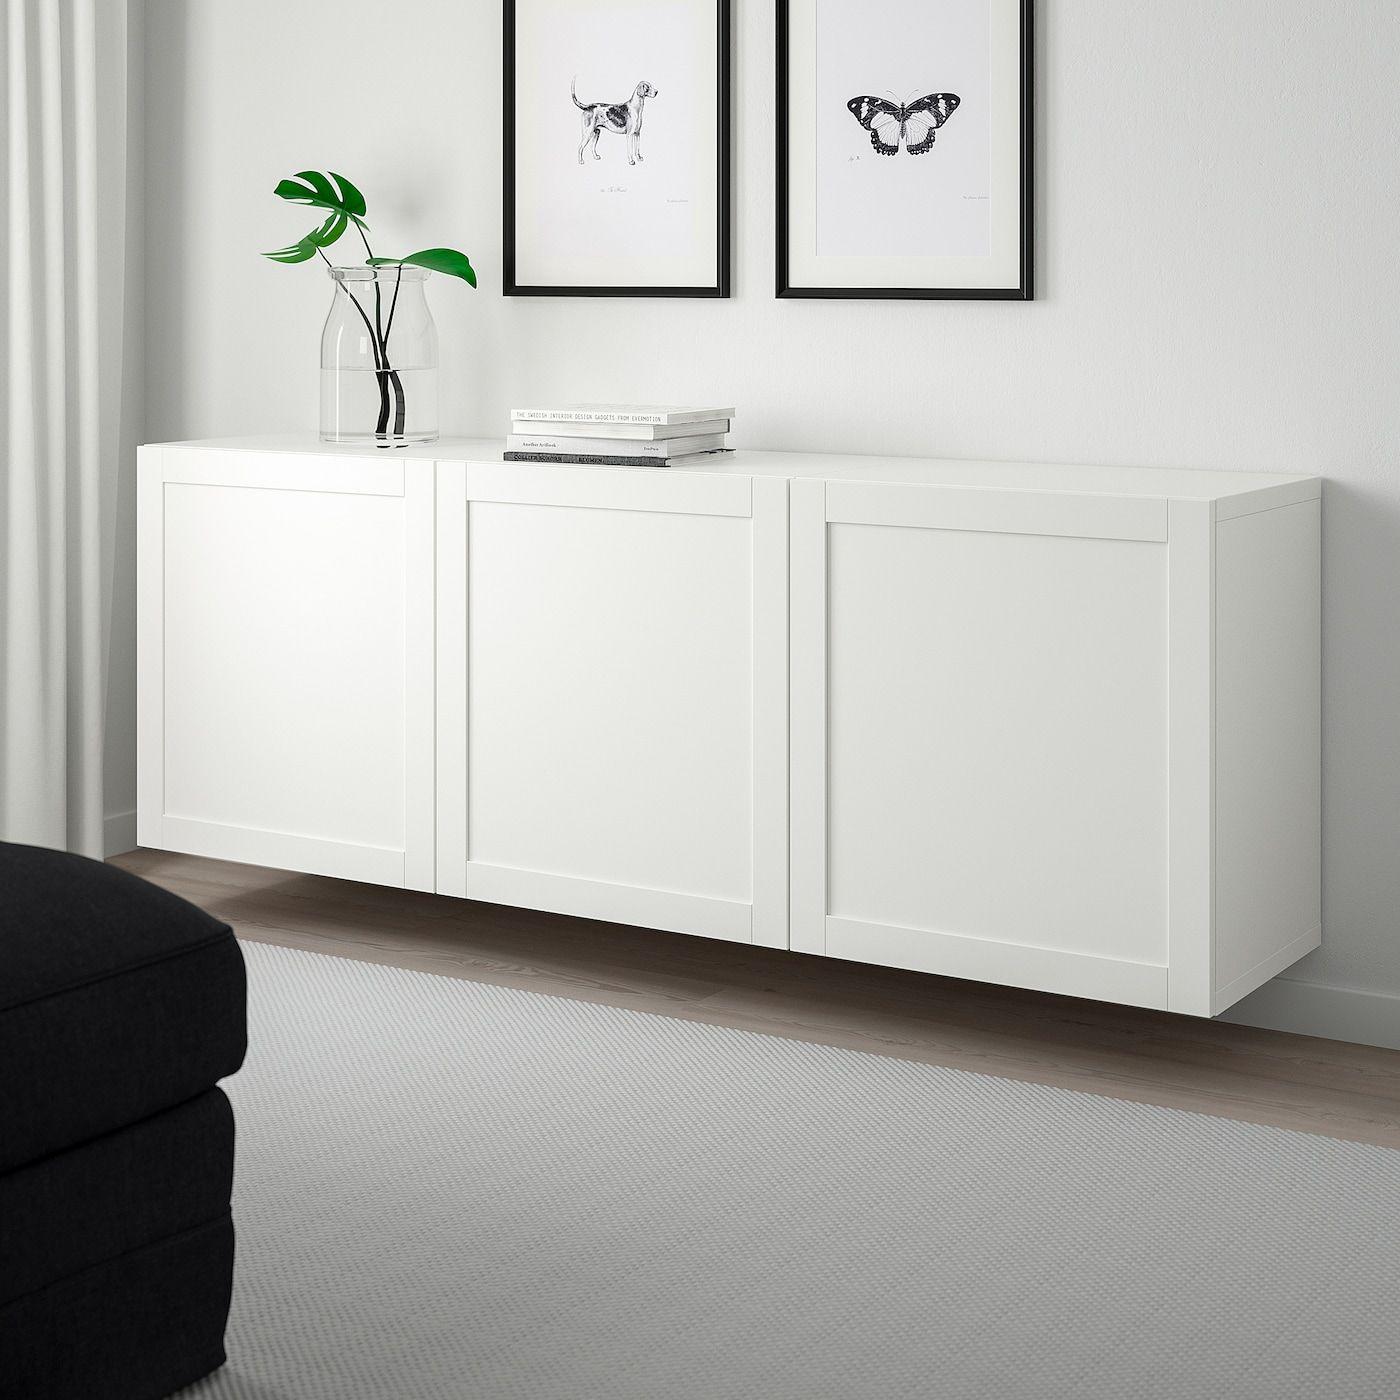 Besta Schrankkombination Fur Wandmontage Weiss Hanviken Weiss Ikea Osterreich Wall Mounted Cabinet Ikea Wall Floating Cabinets